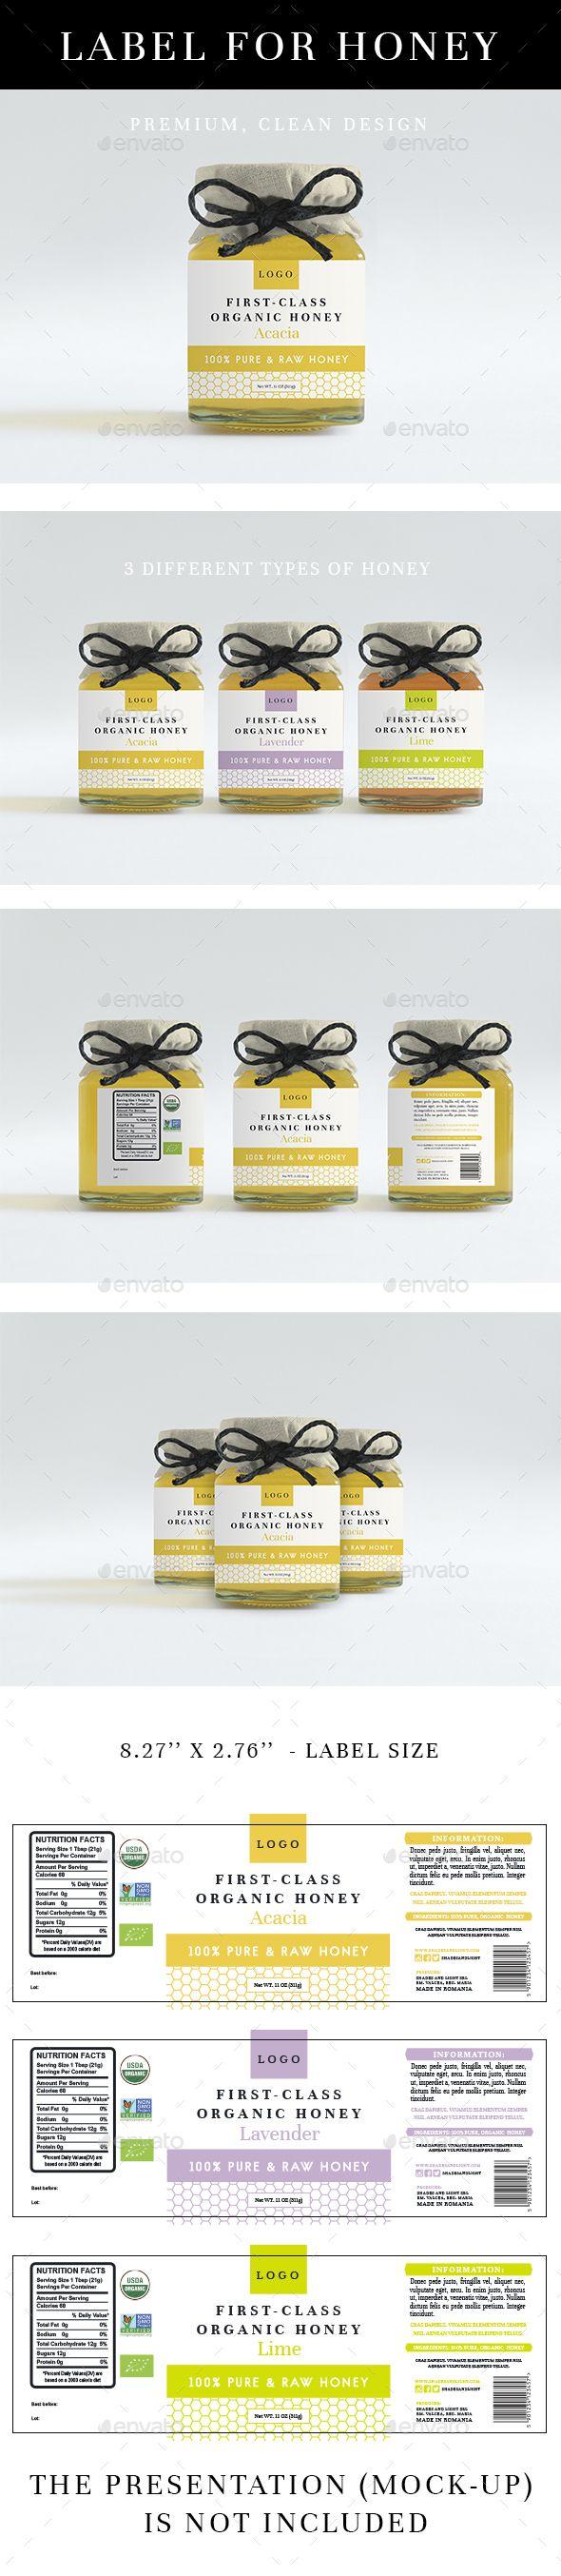 Honey Label | Empaques